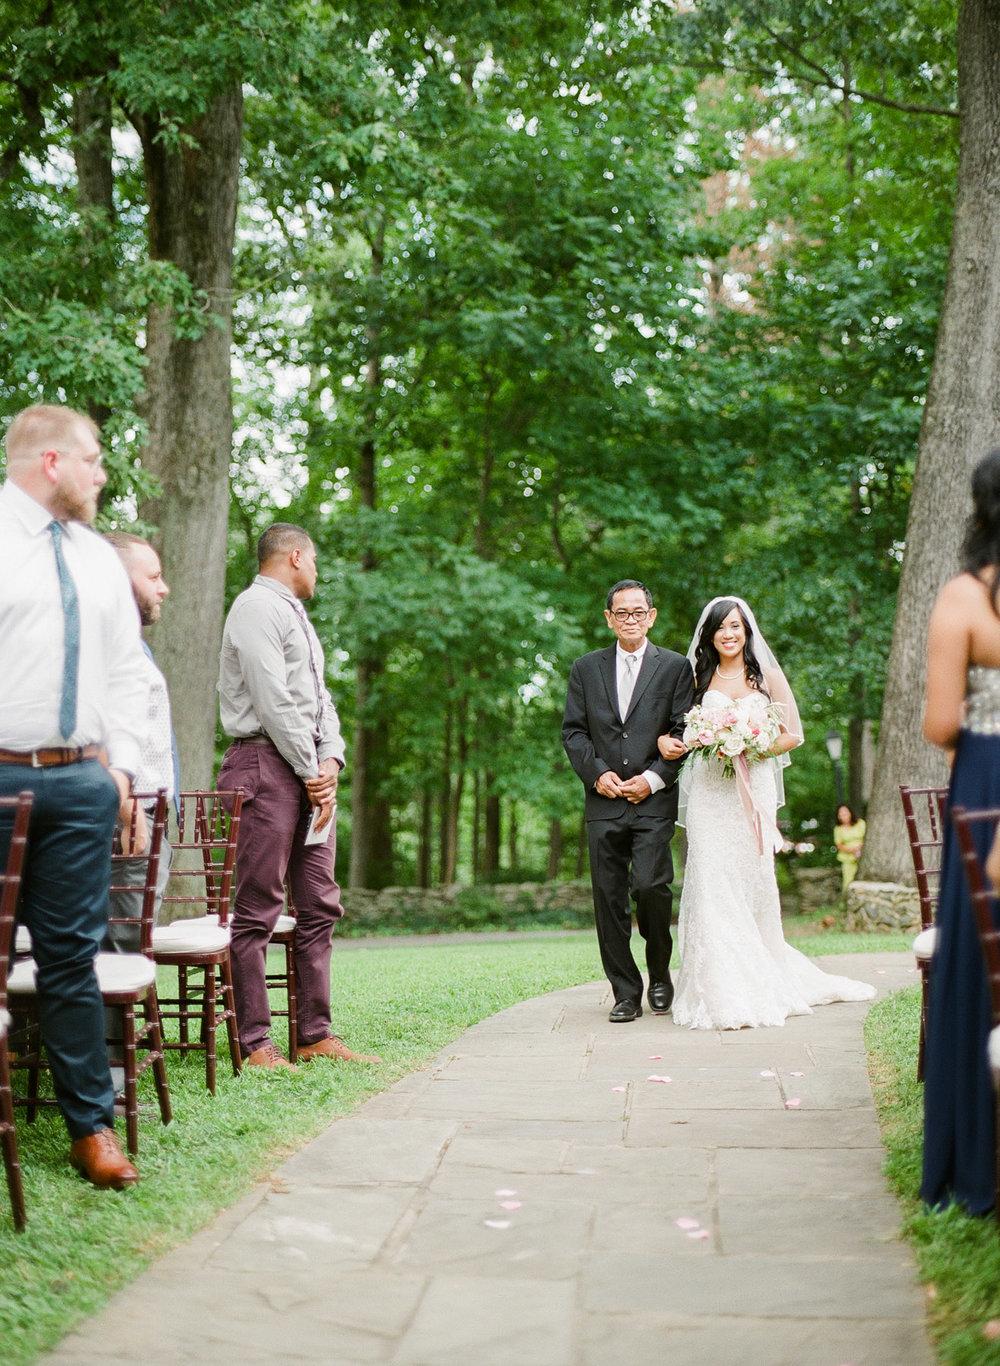 Virginia-Film-Photographer-Wedding-07.jpg